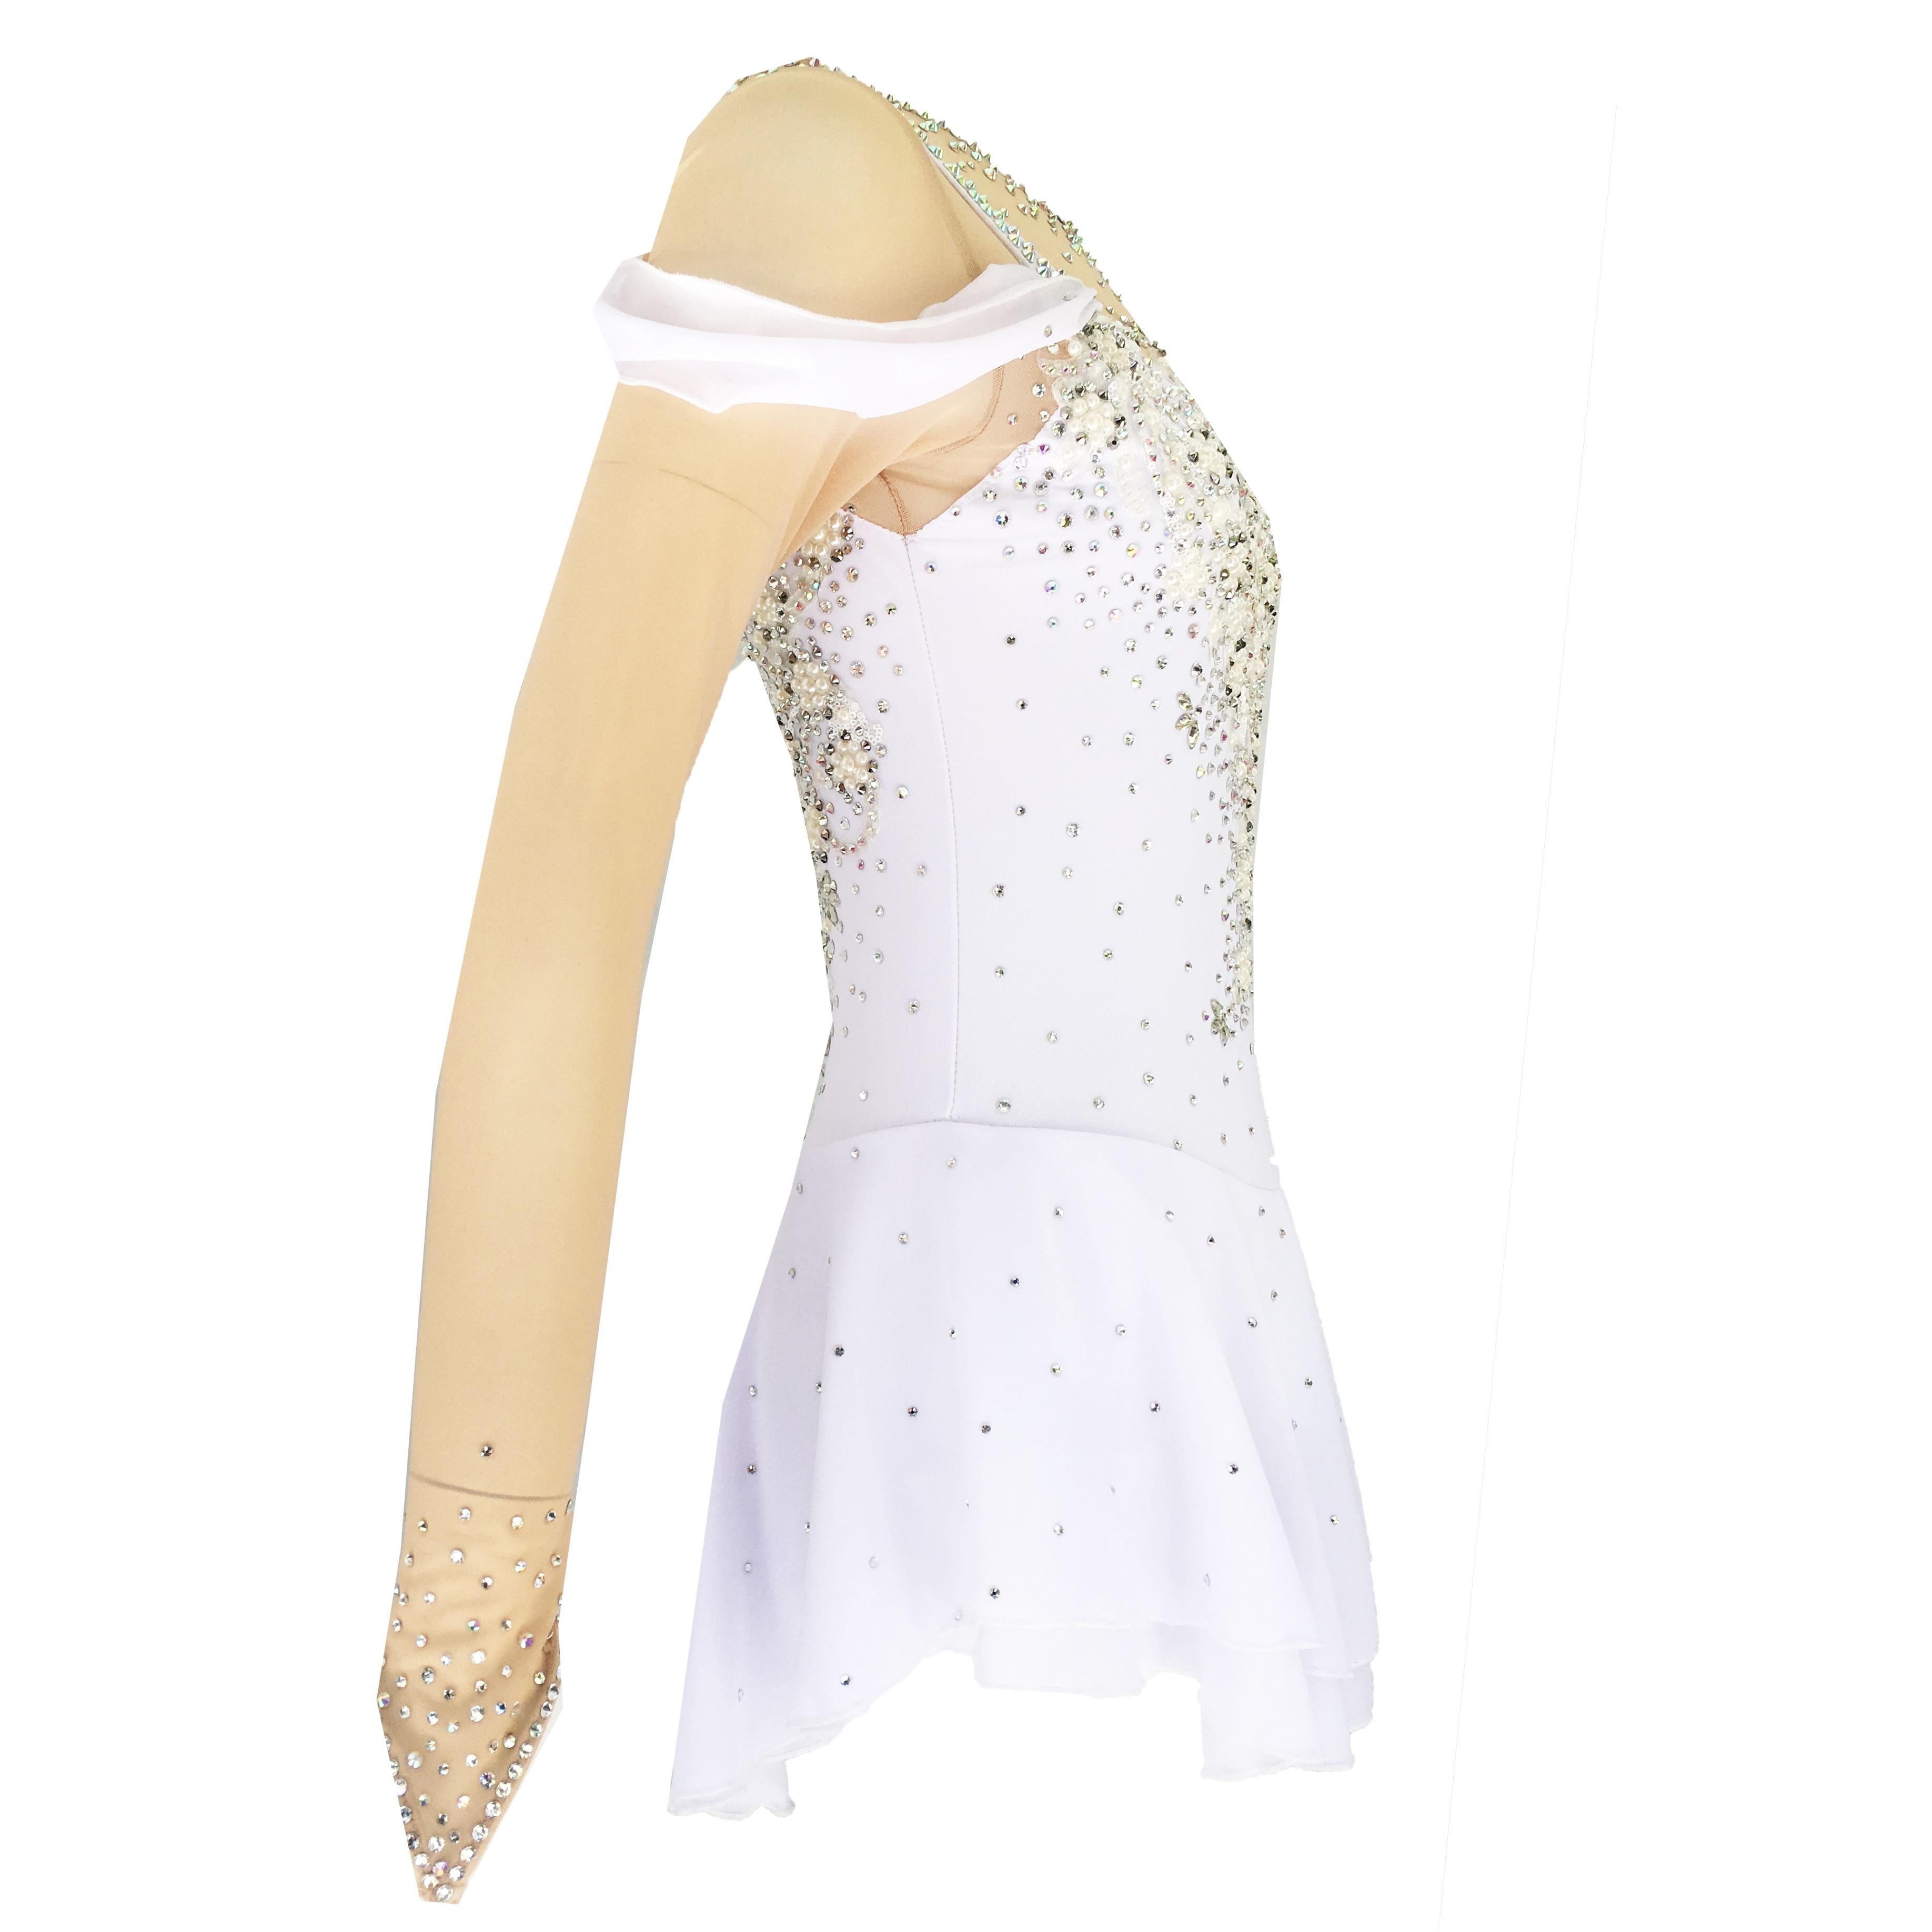 White Figure Skating Dress Women's Girls' Ice Skating Dress Khaki Open Back Spandex High Elasticity Training Skating